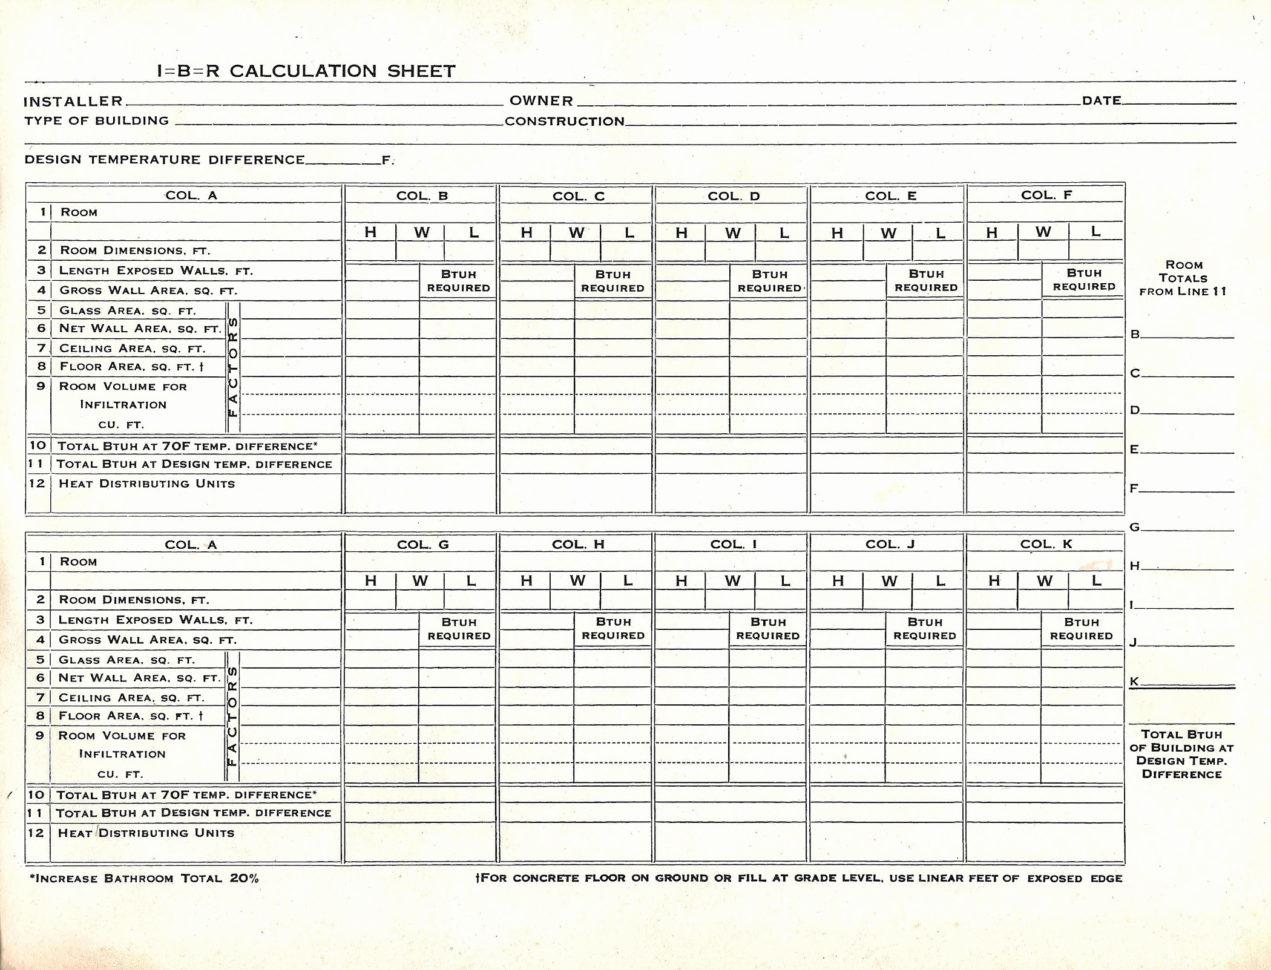 Hvac Load Calculation Spreadsheet Inside Load Calculation Spreadsheet For Hvac Load Calculation Spreadsheet